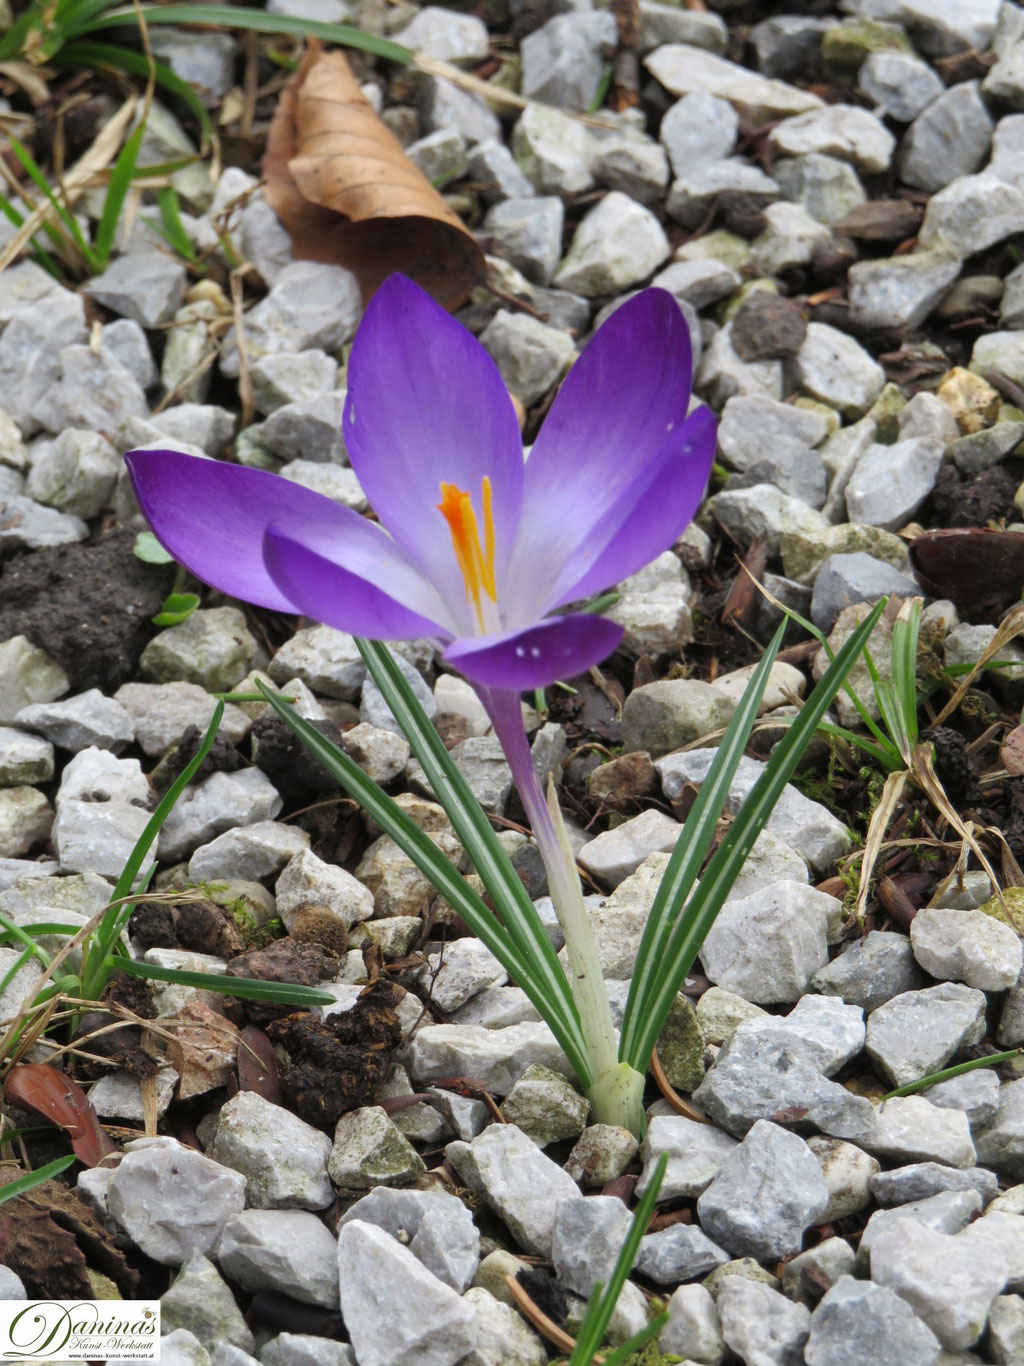 Krokus - Frühlingsblumen im Garten